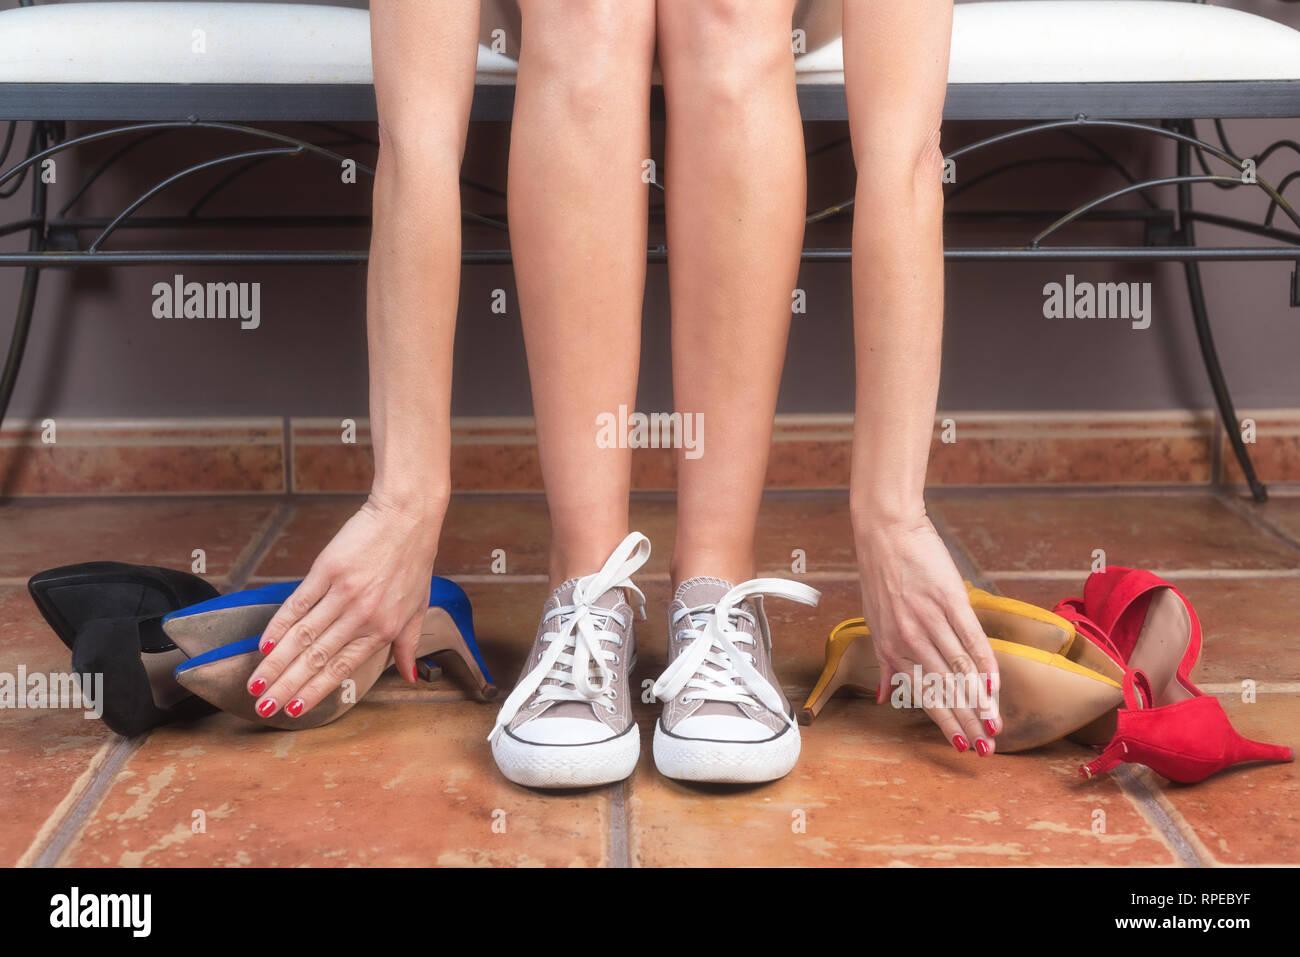 cfb22e3deb8 Woman with perfect slim legs